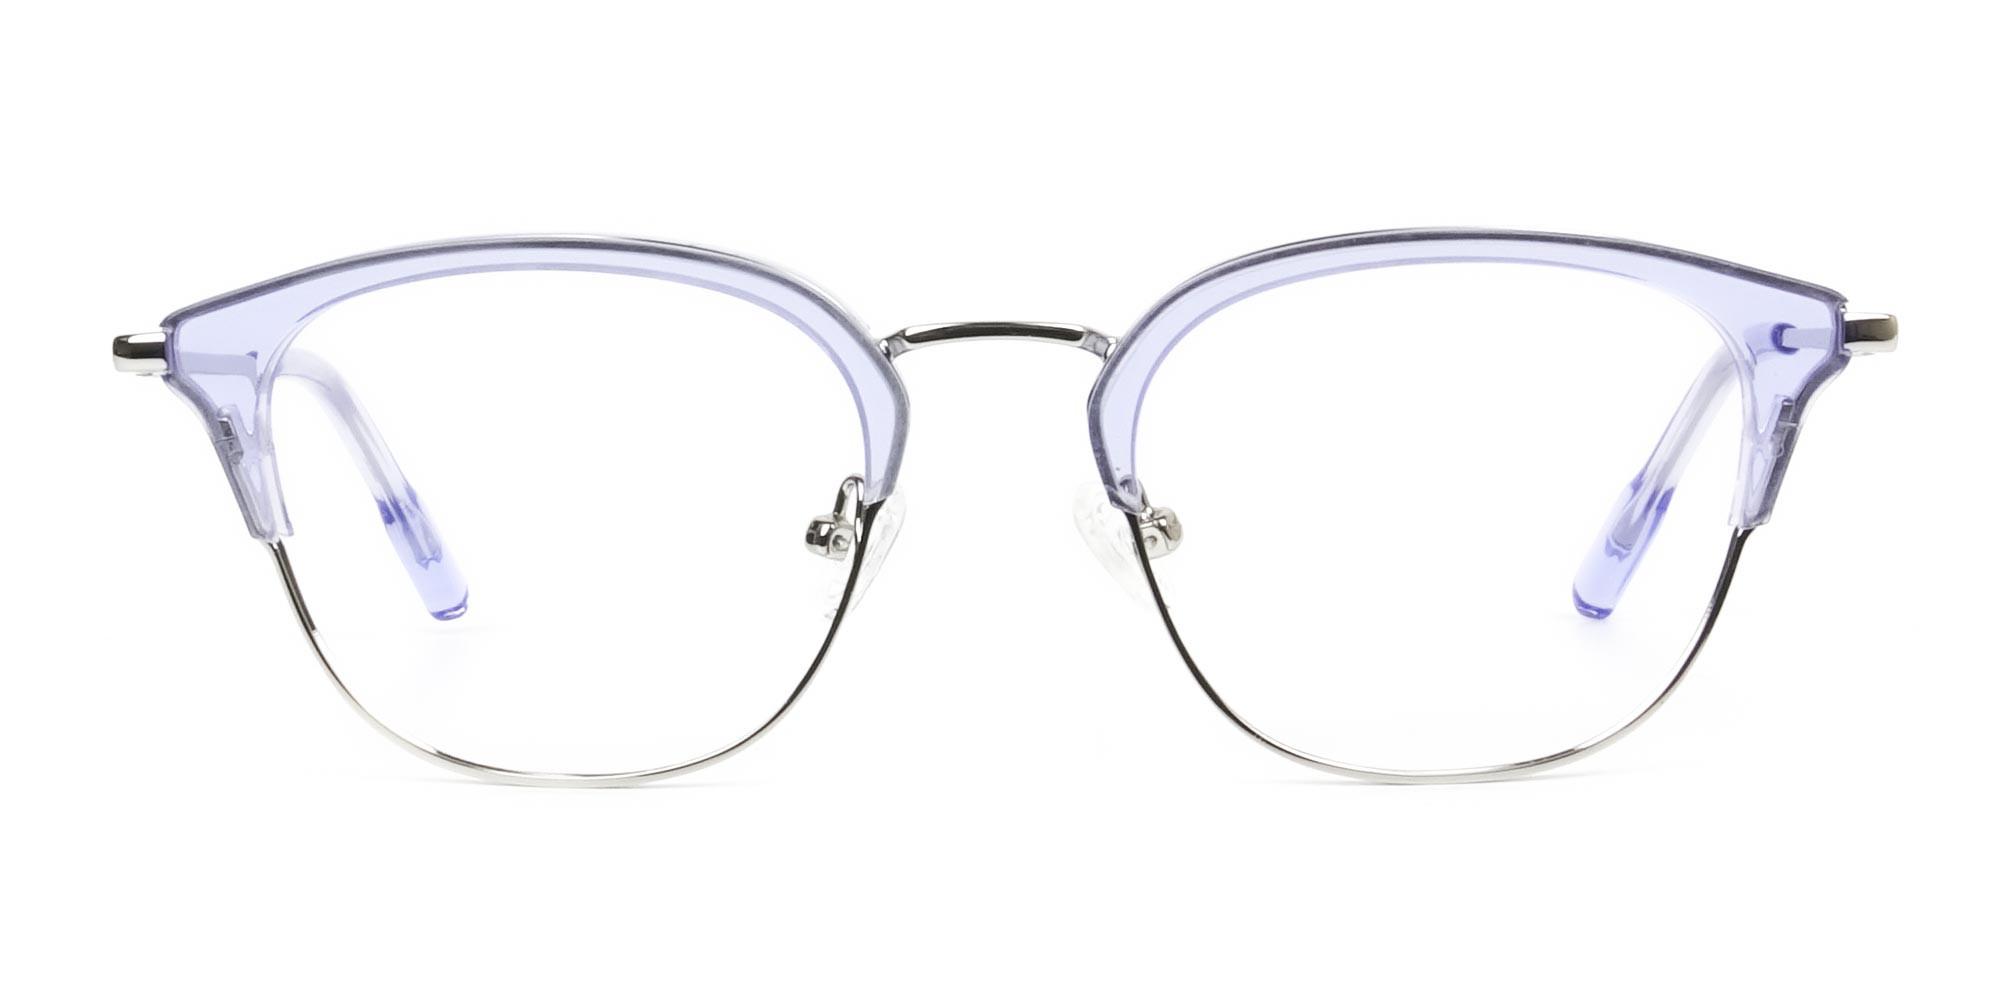 Silver & Crystal Periwinkle Purple Glasses - 1